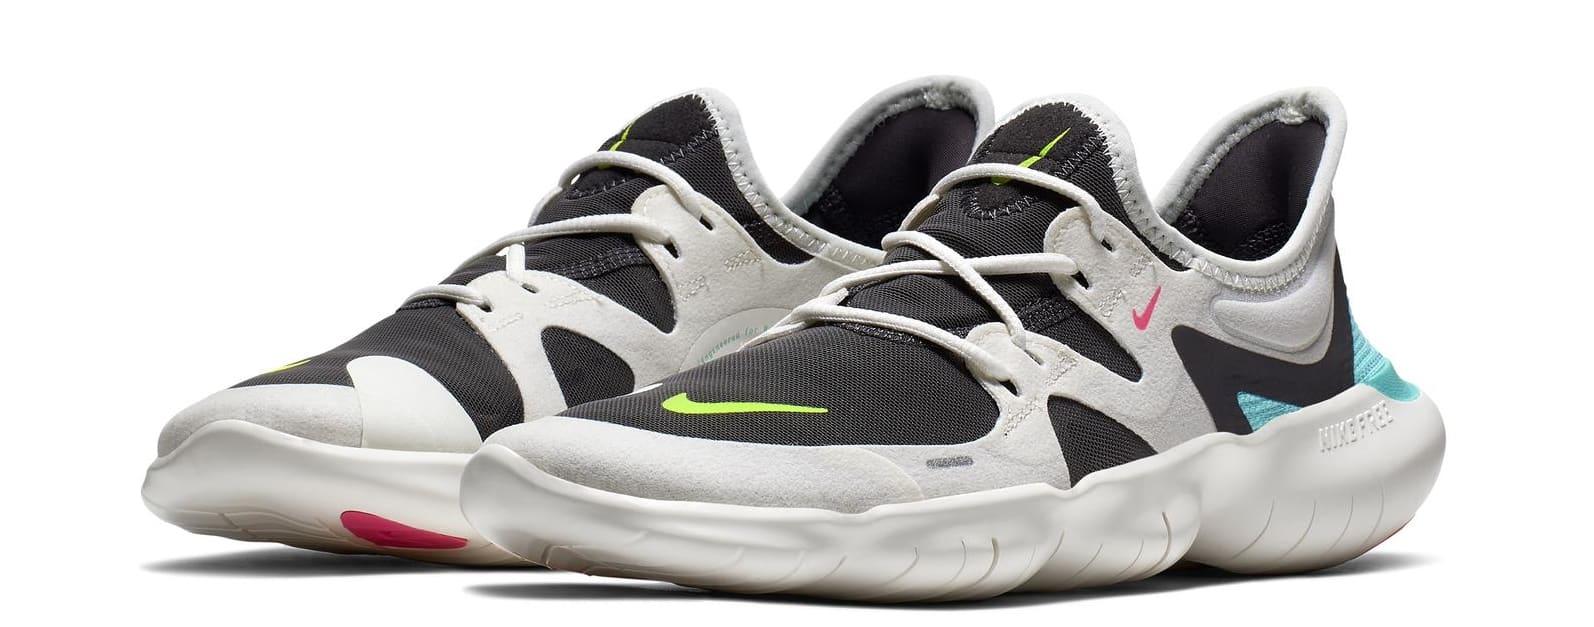 outlet store 47a05 112da Nike Free RN 5.0 (Pair)